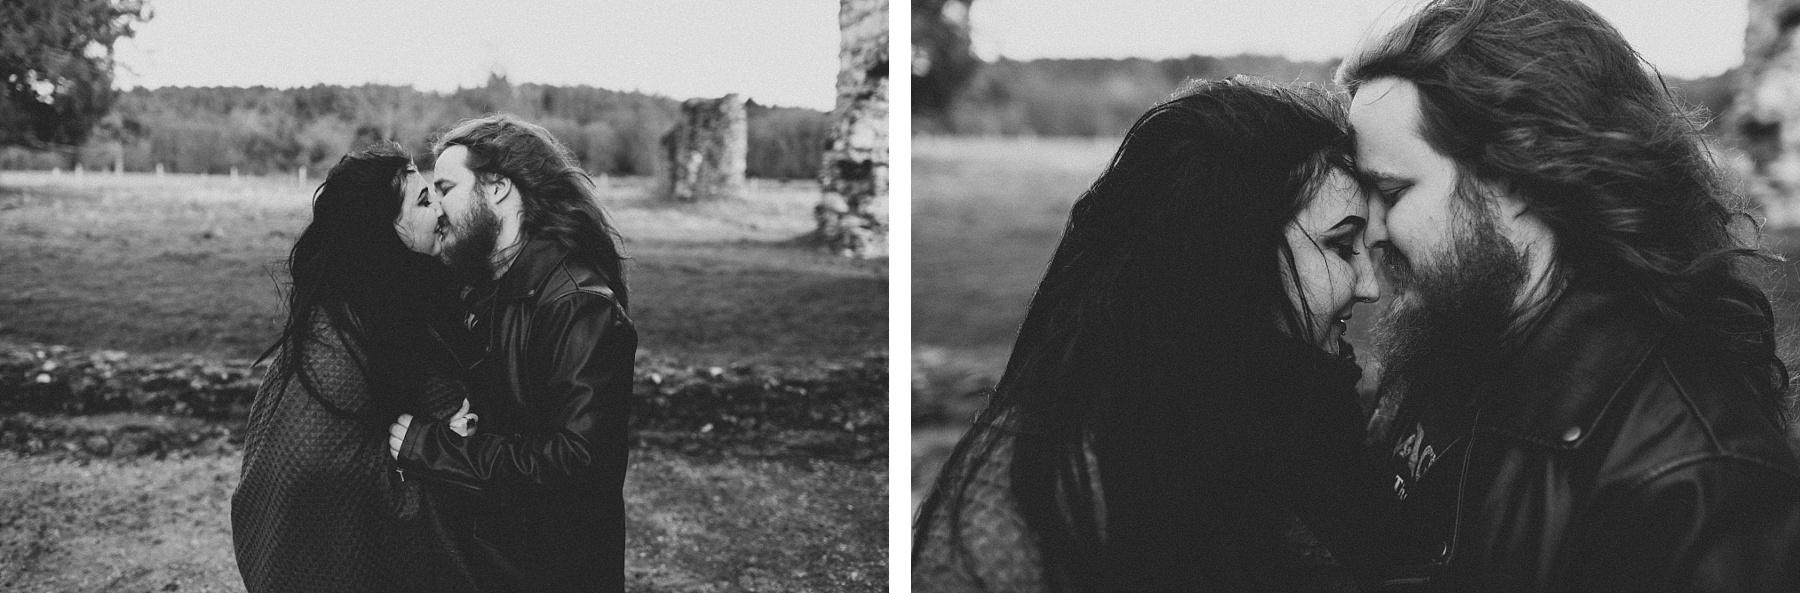 black & white couple photograph